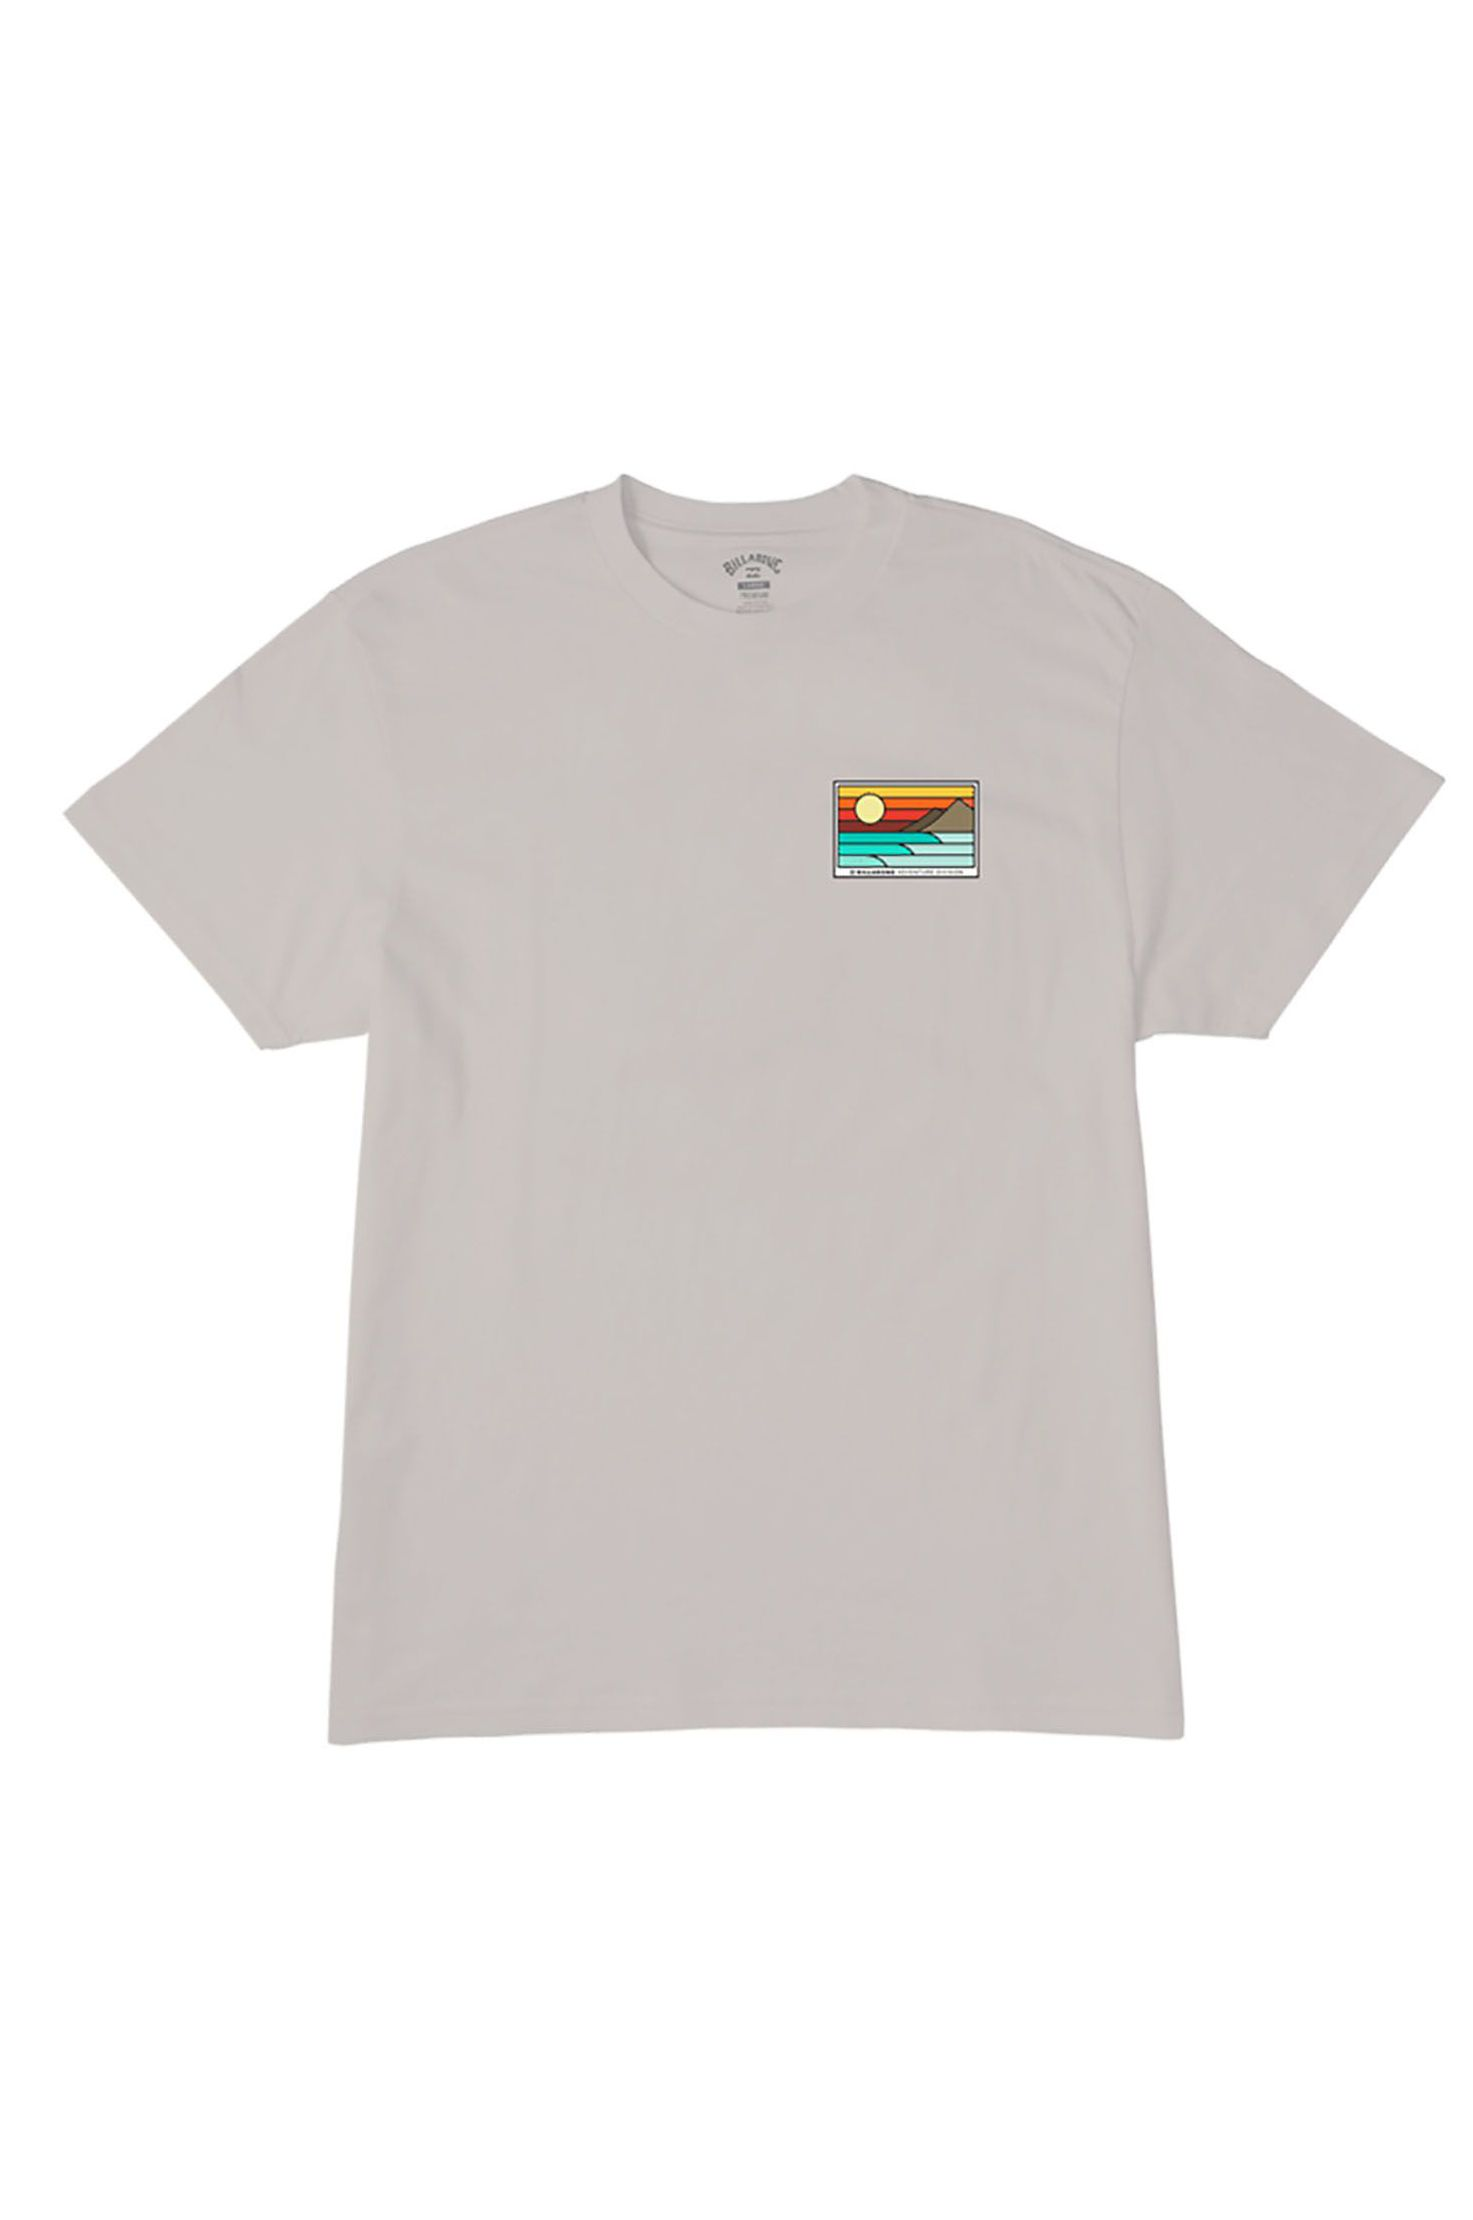 T-Shirt Billabong PROSPECT SS ADVENTURE DIVISION Chino